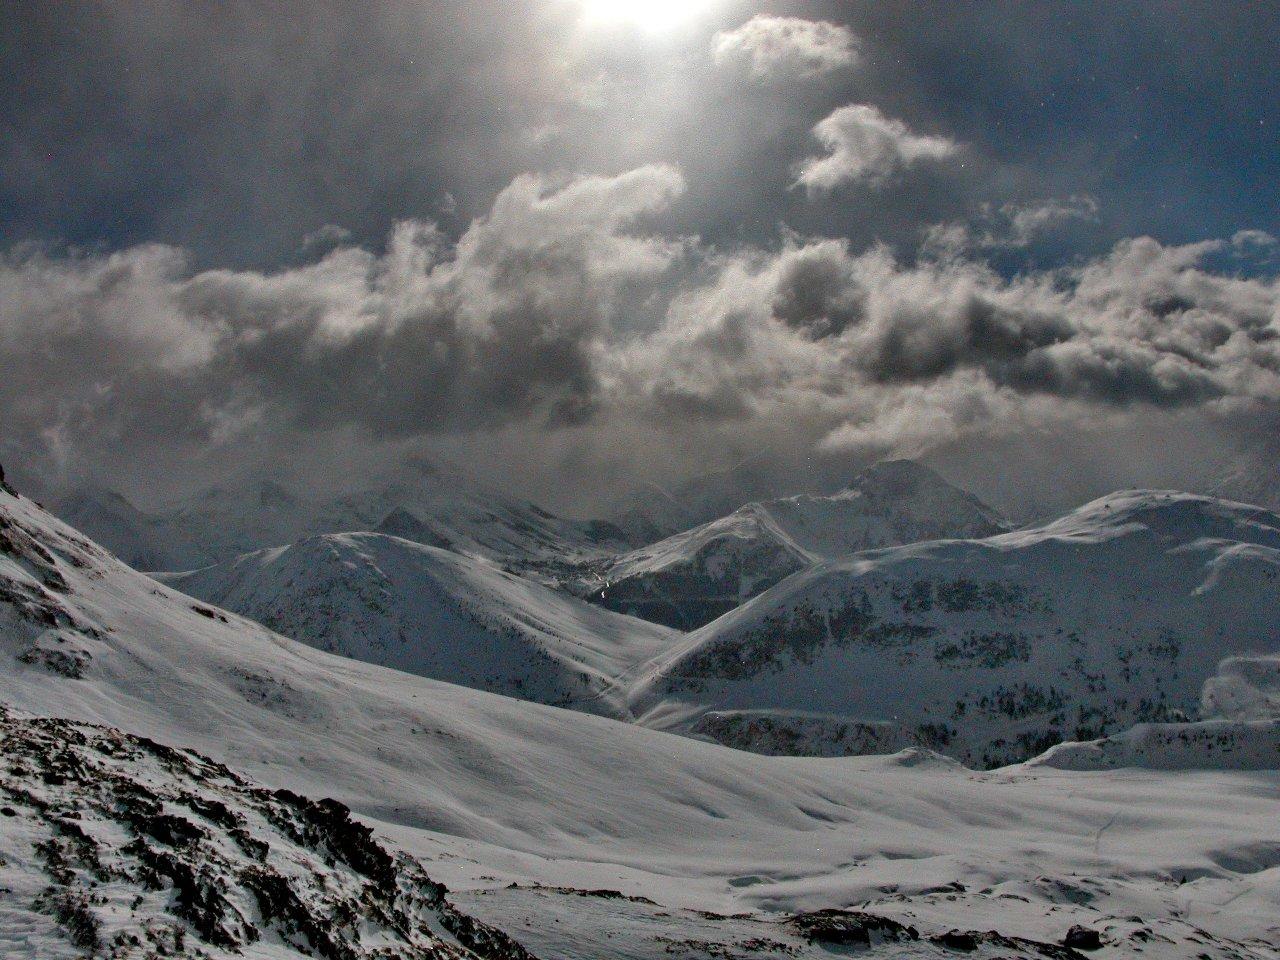 На высоте выше 4000 м круглый год царит зима